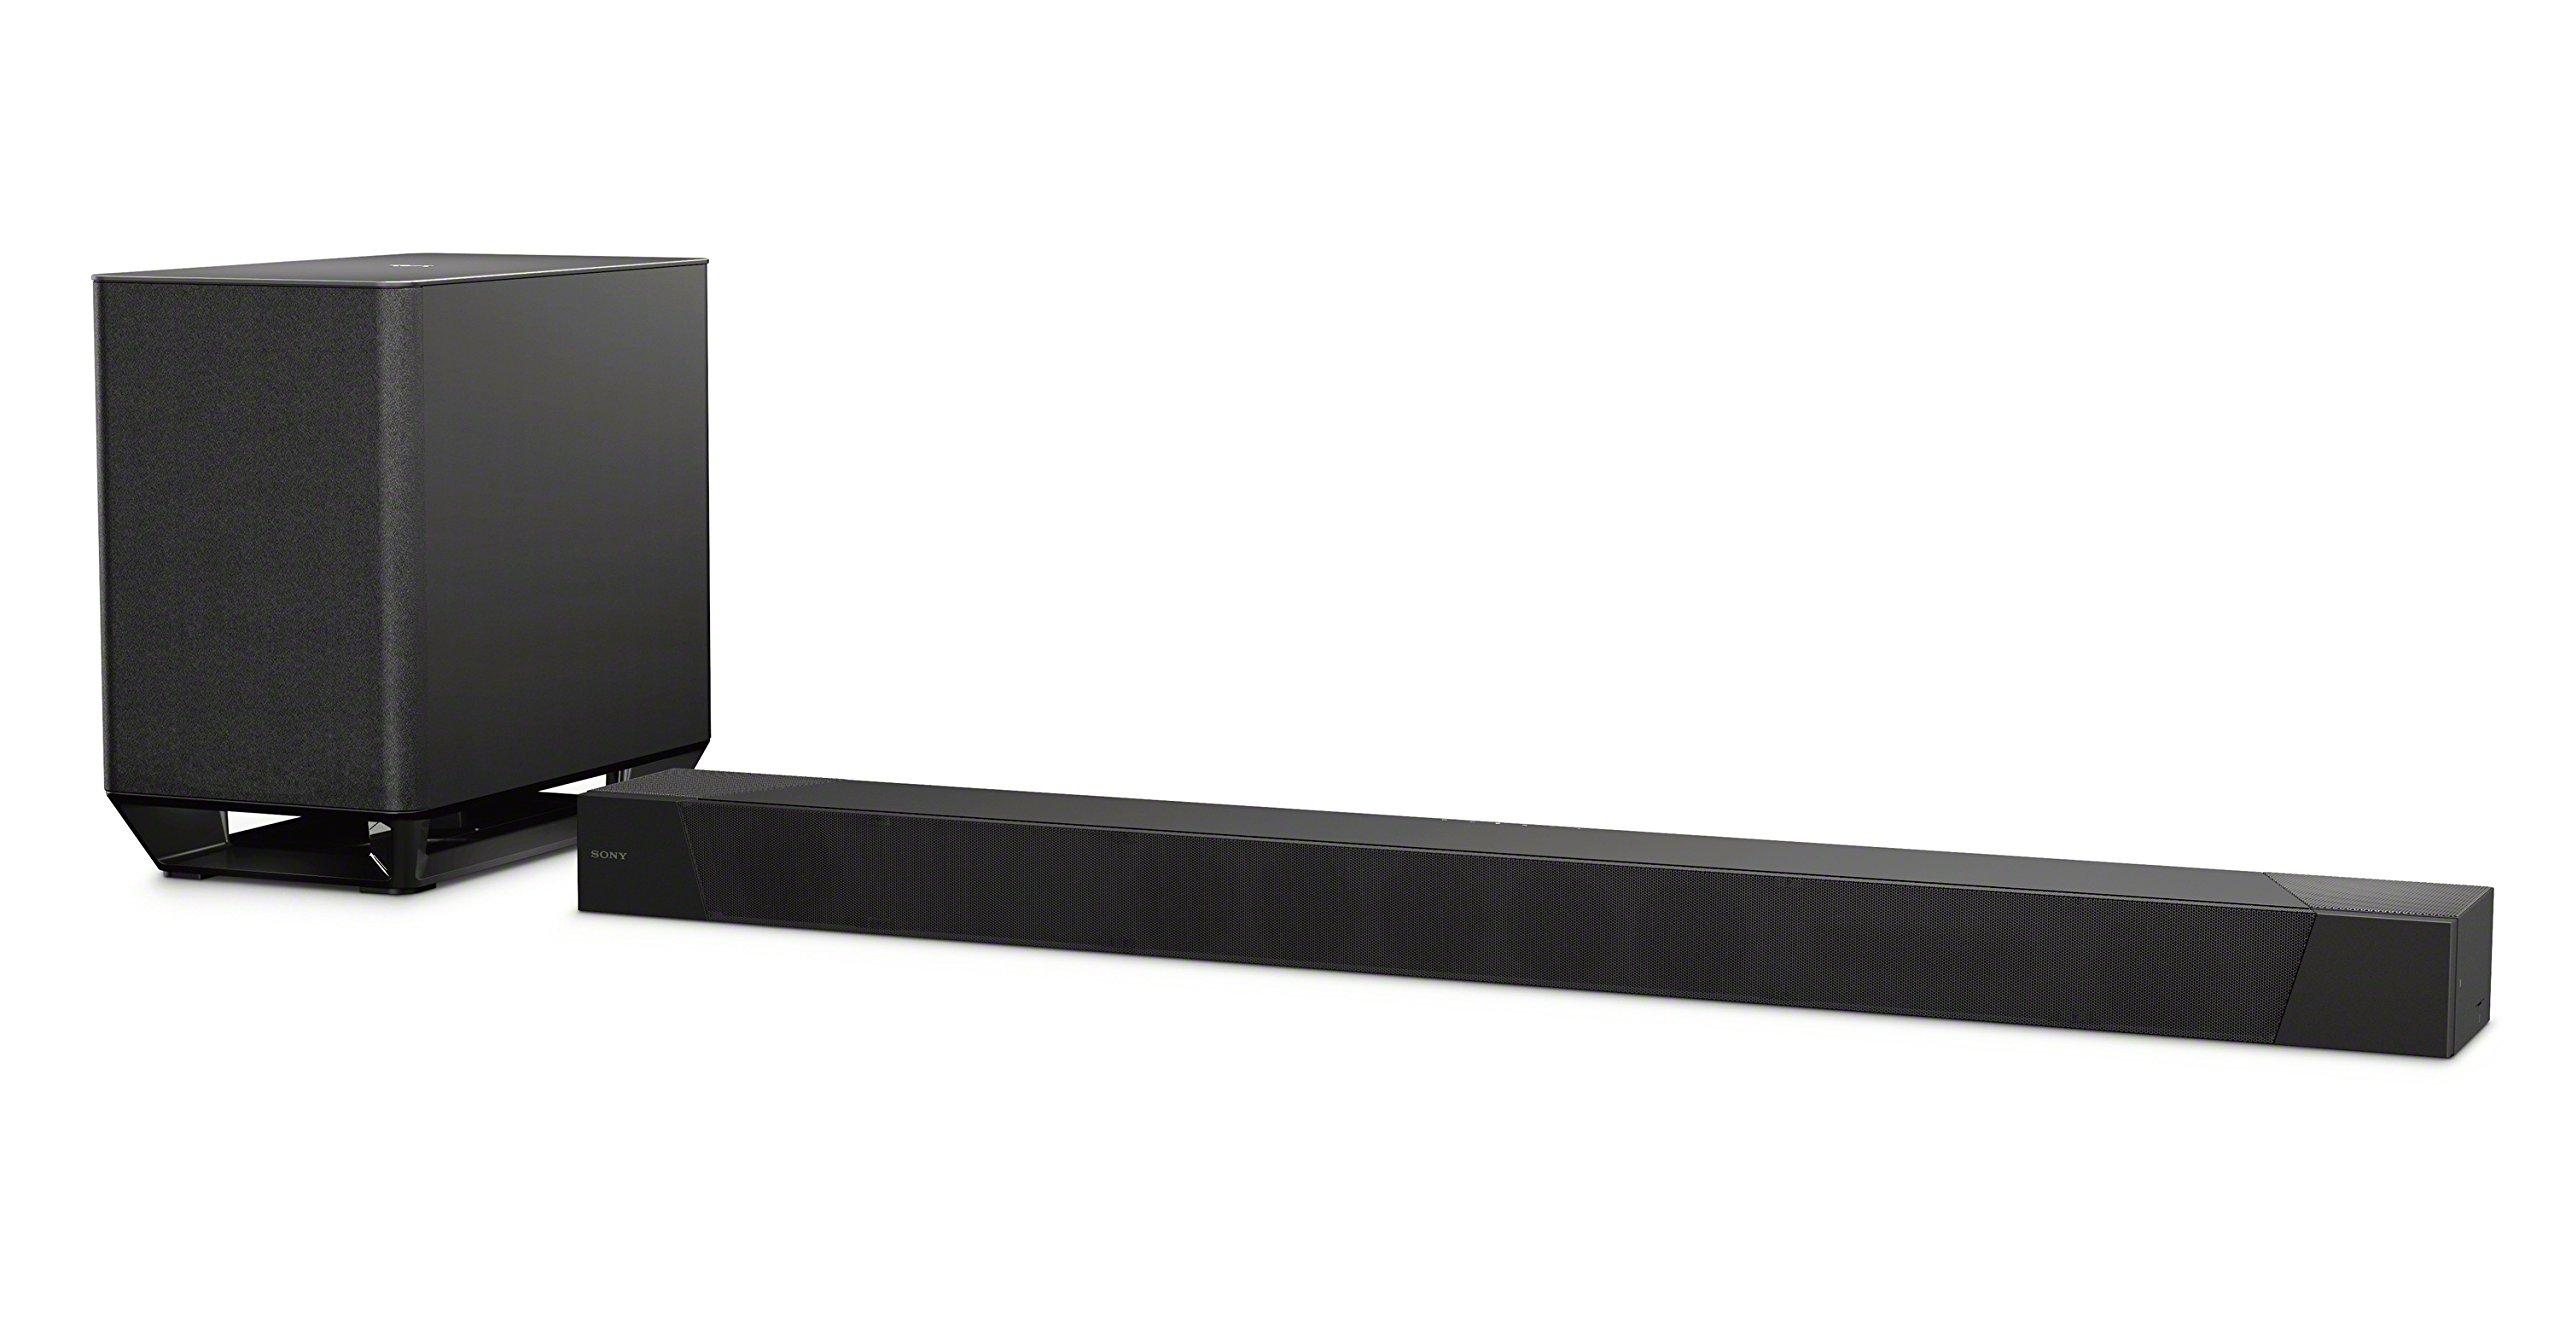 Sony 7 1 2ch Wireless Subwoofer HT ST5000